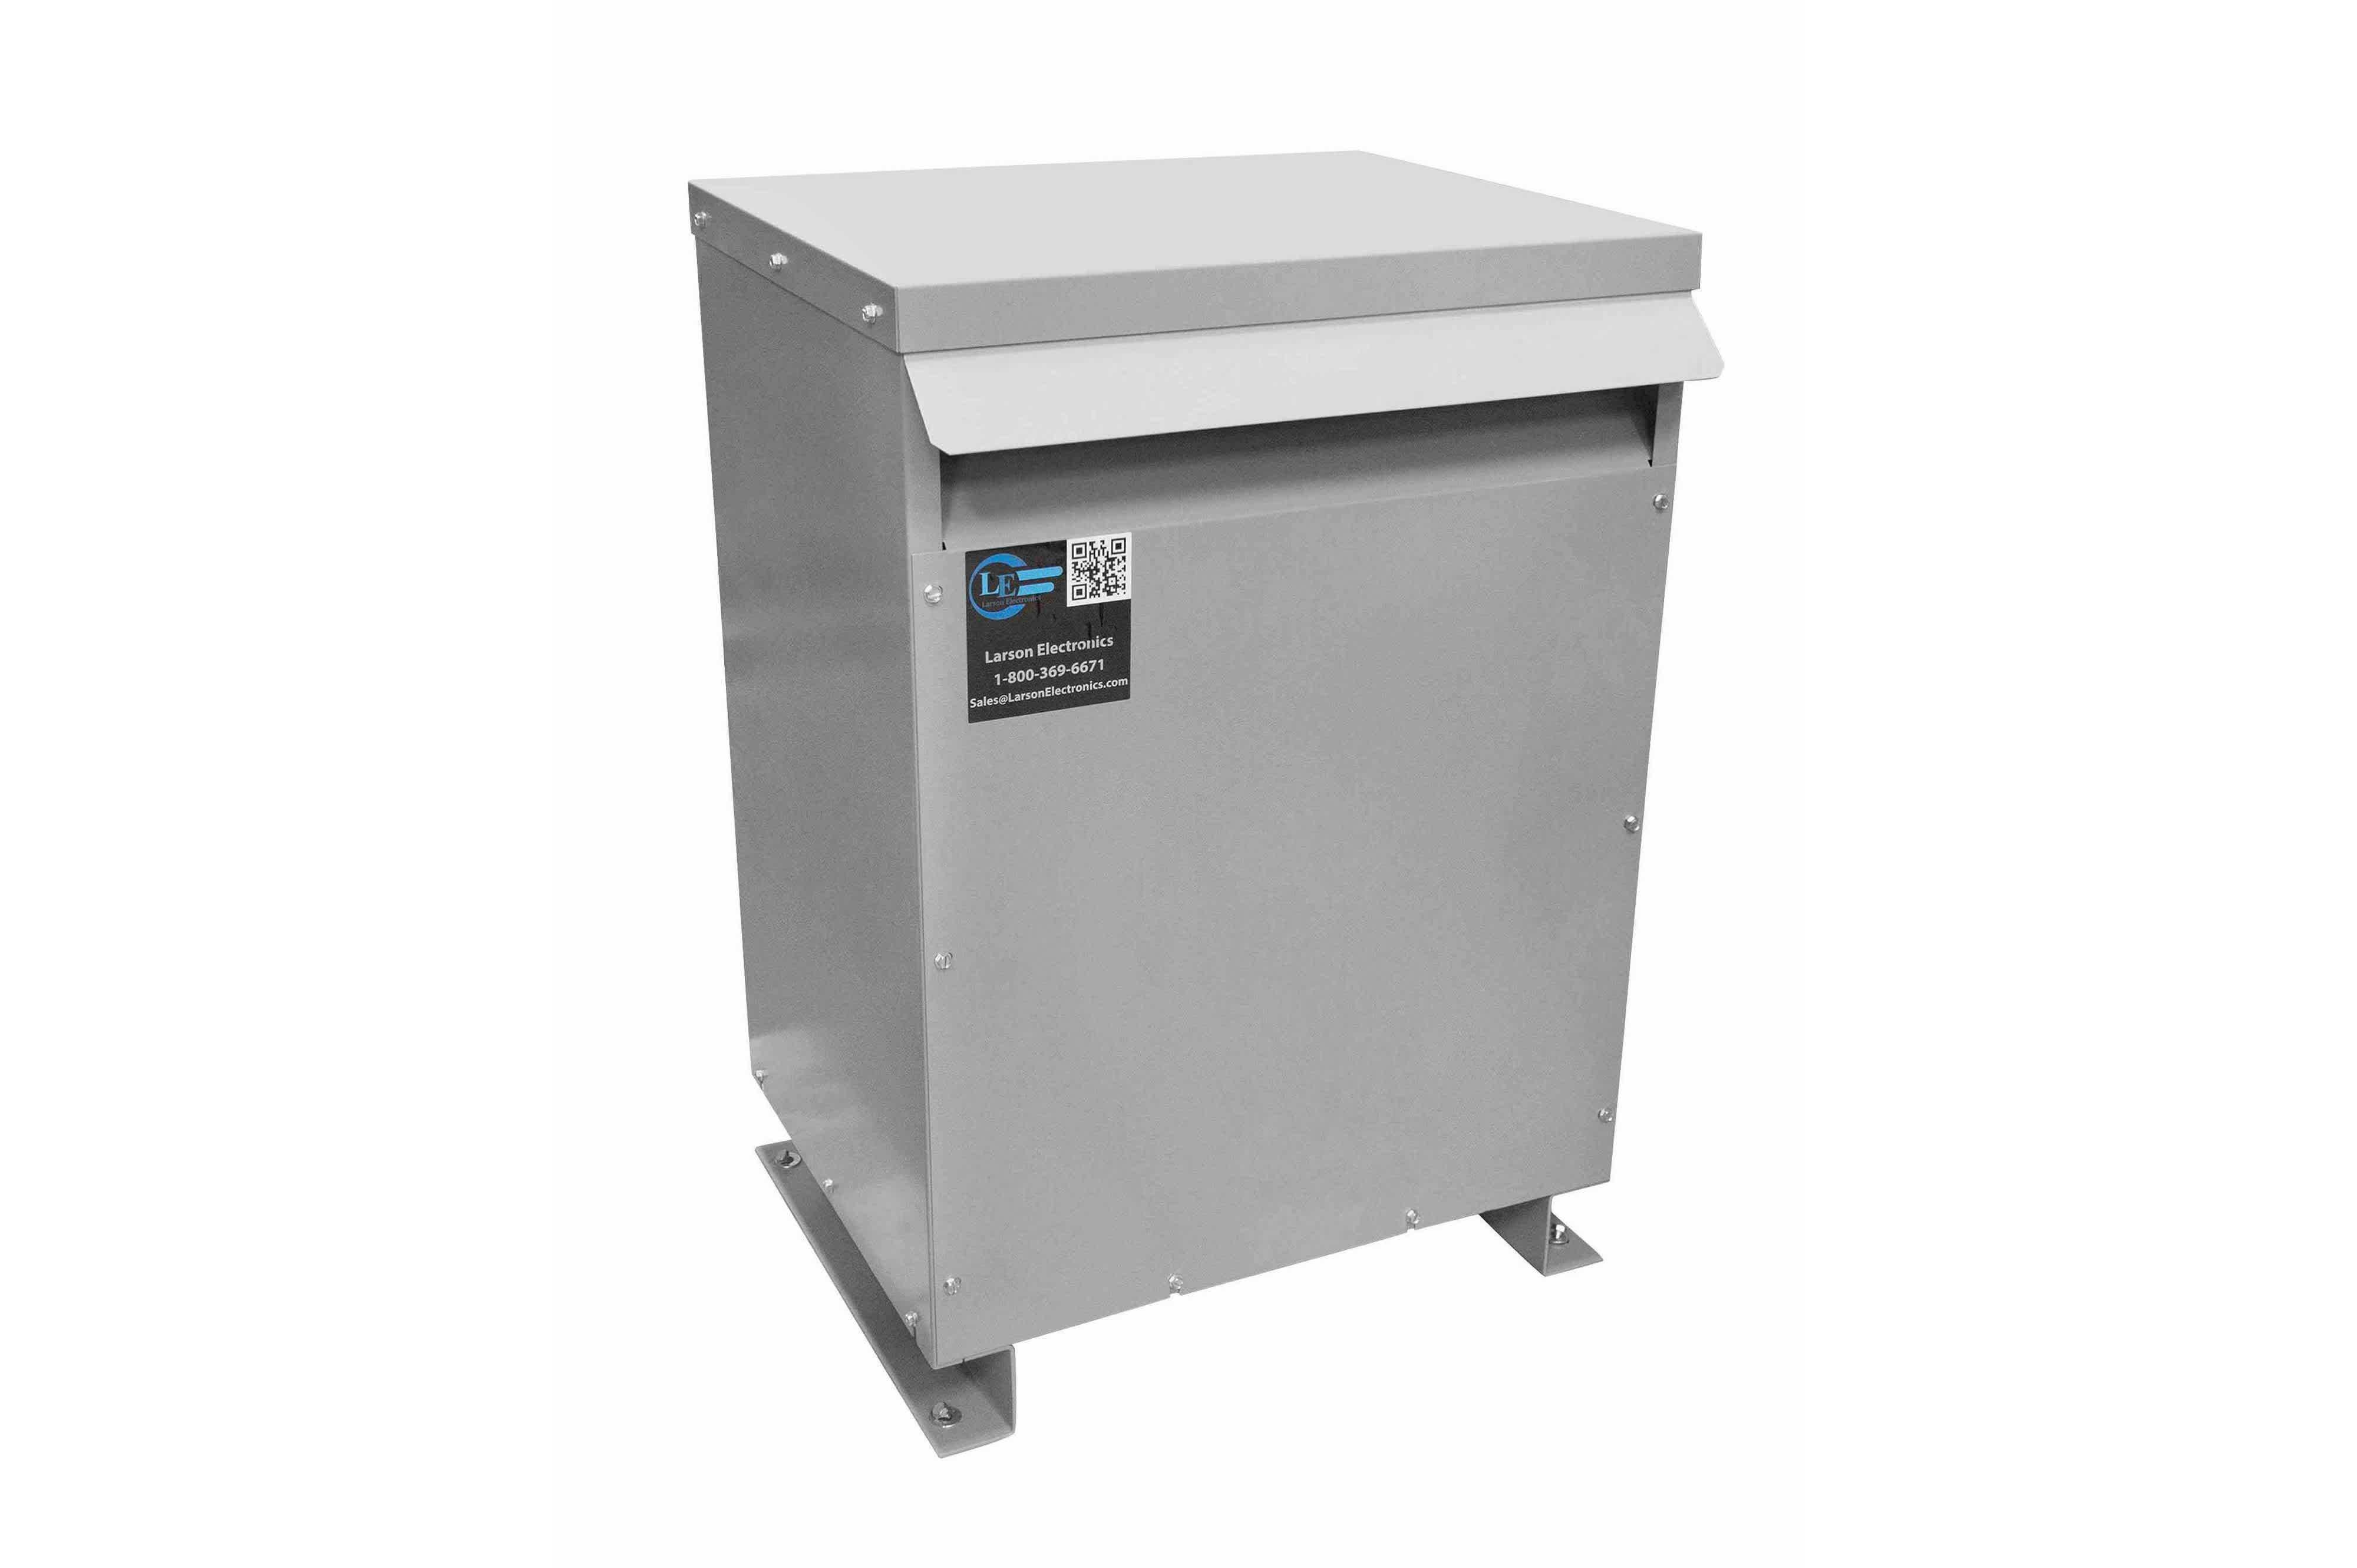 400 kVA 3PH Isolation Transformer, 480V Wye Primary, 380V Delta Secondary, N3R, Ventilated, 60 Hz